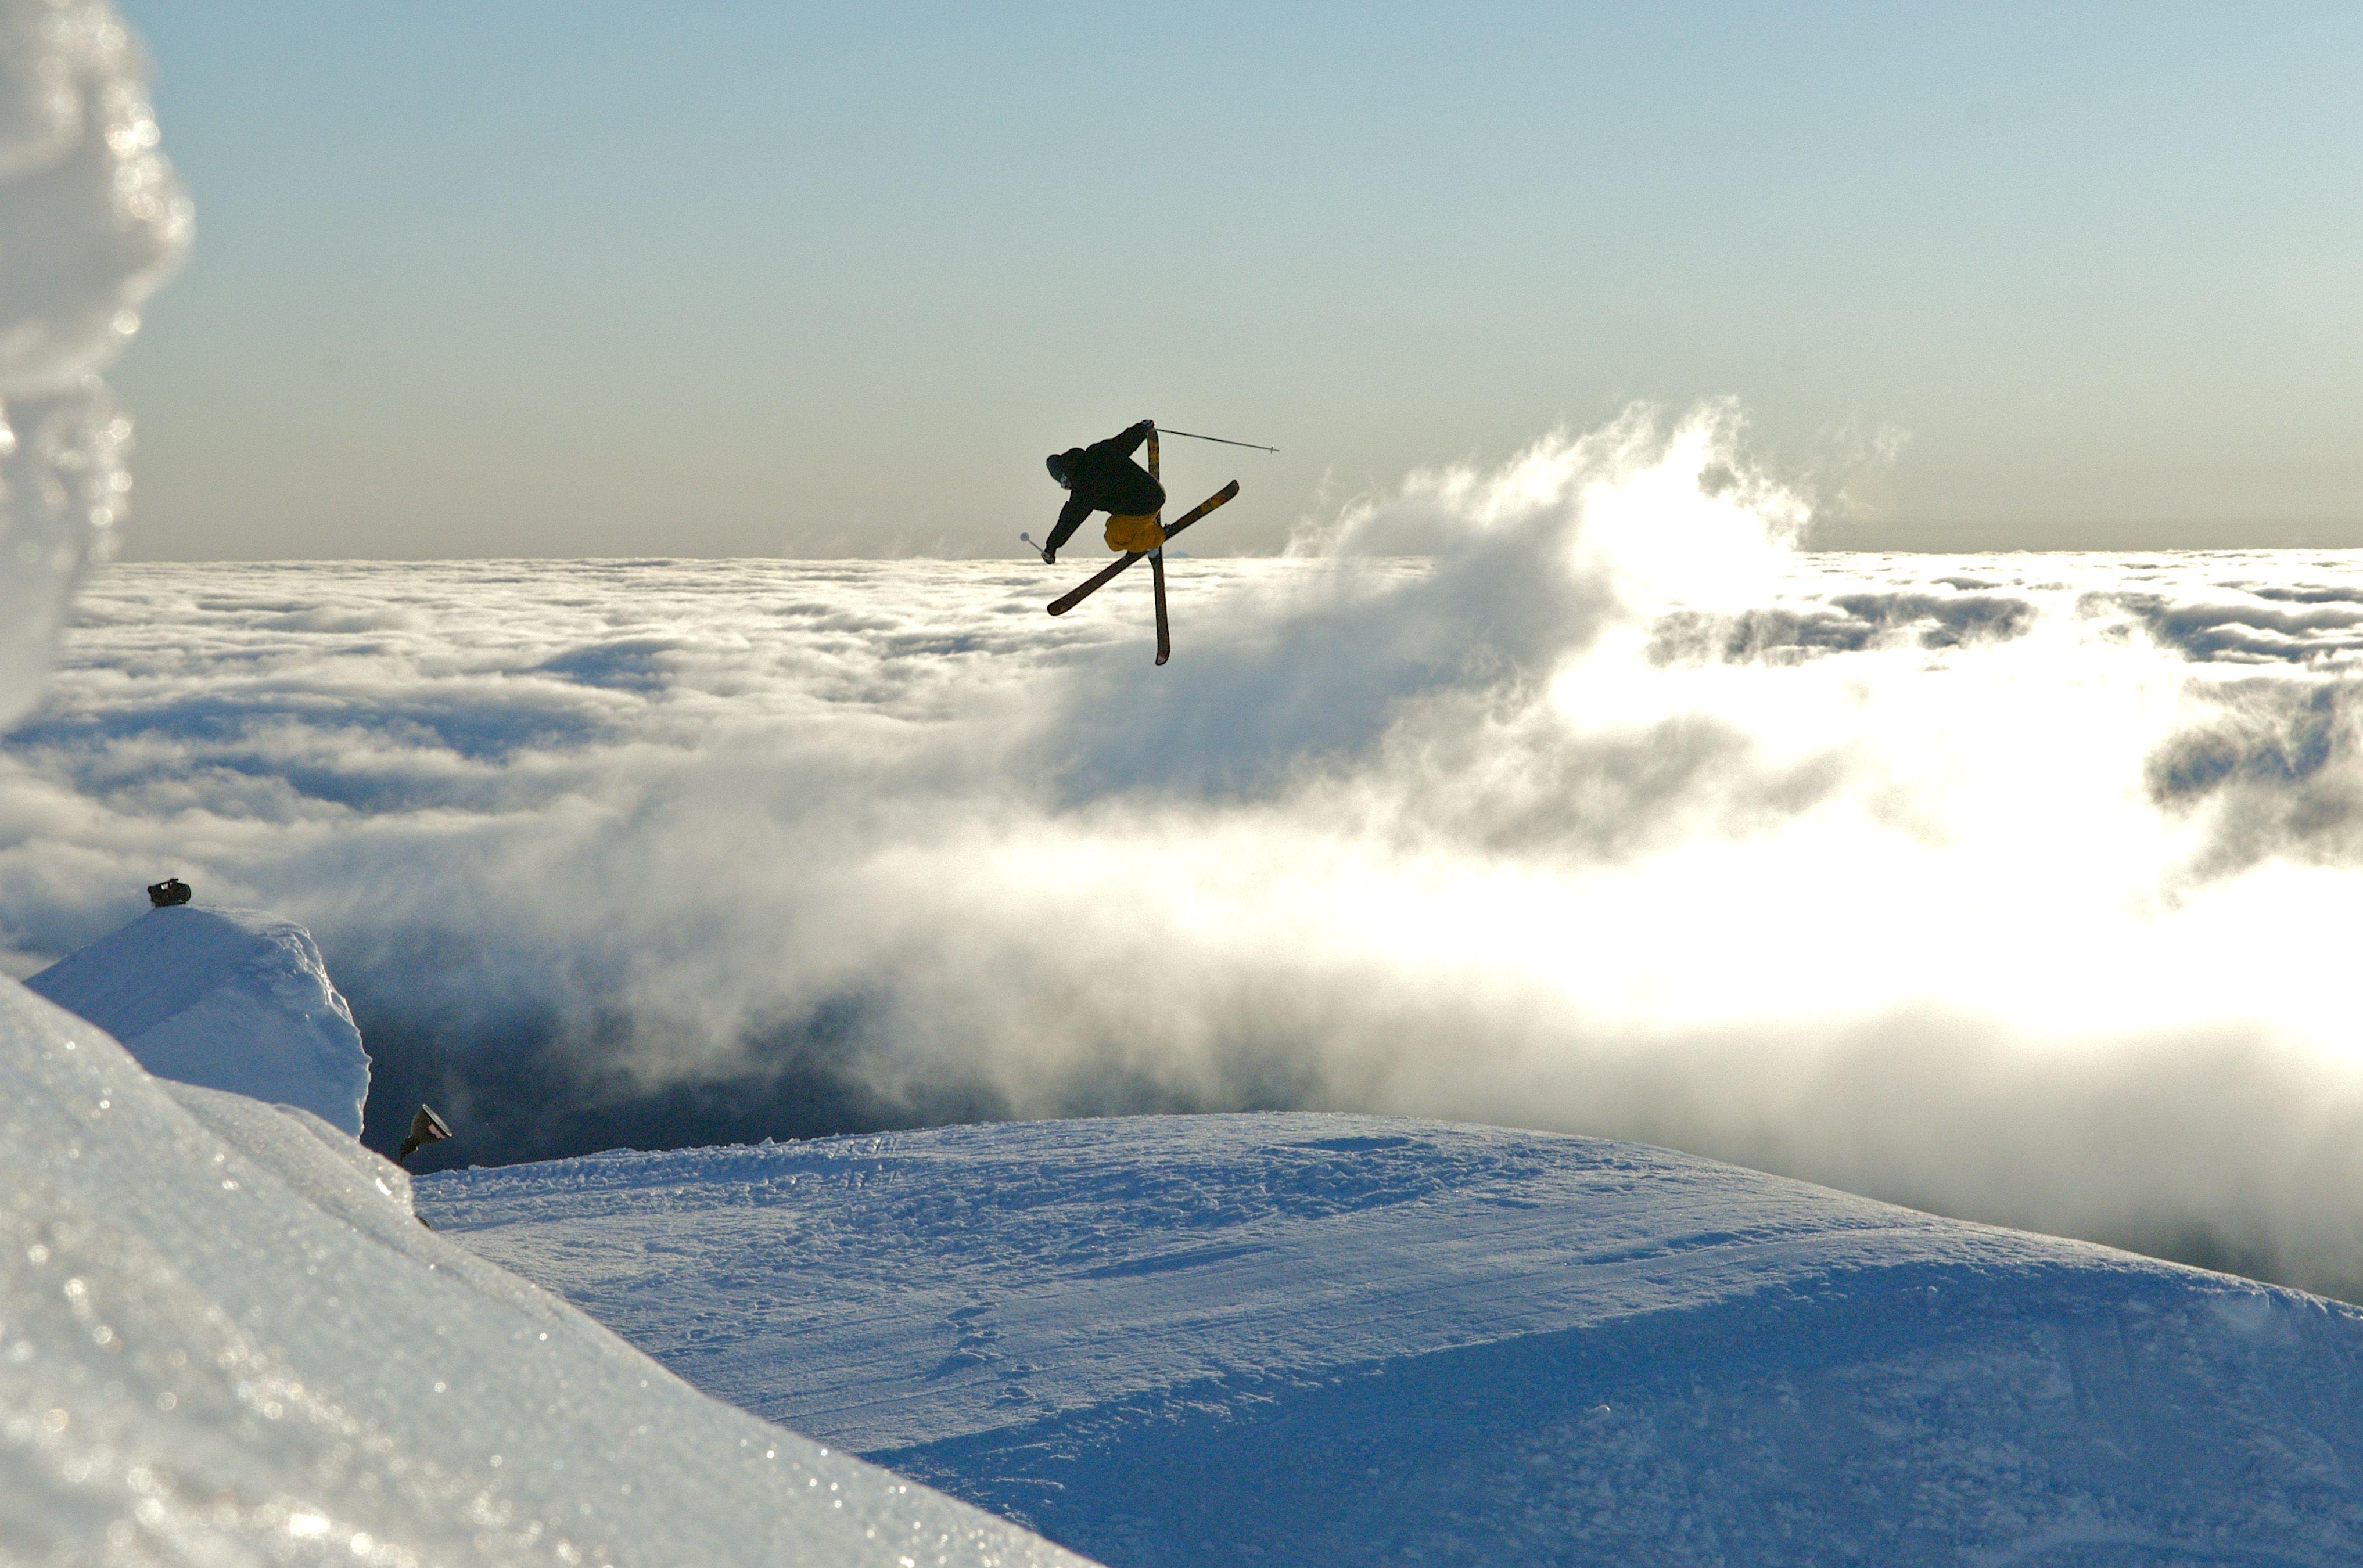 Candide Thovex ©Ducasse snow Snow skiing, Ski culture